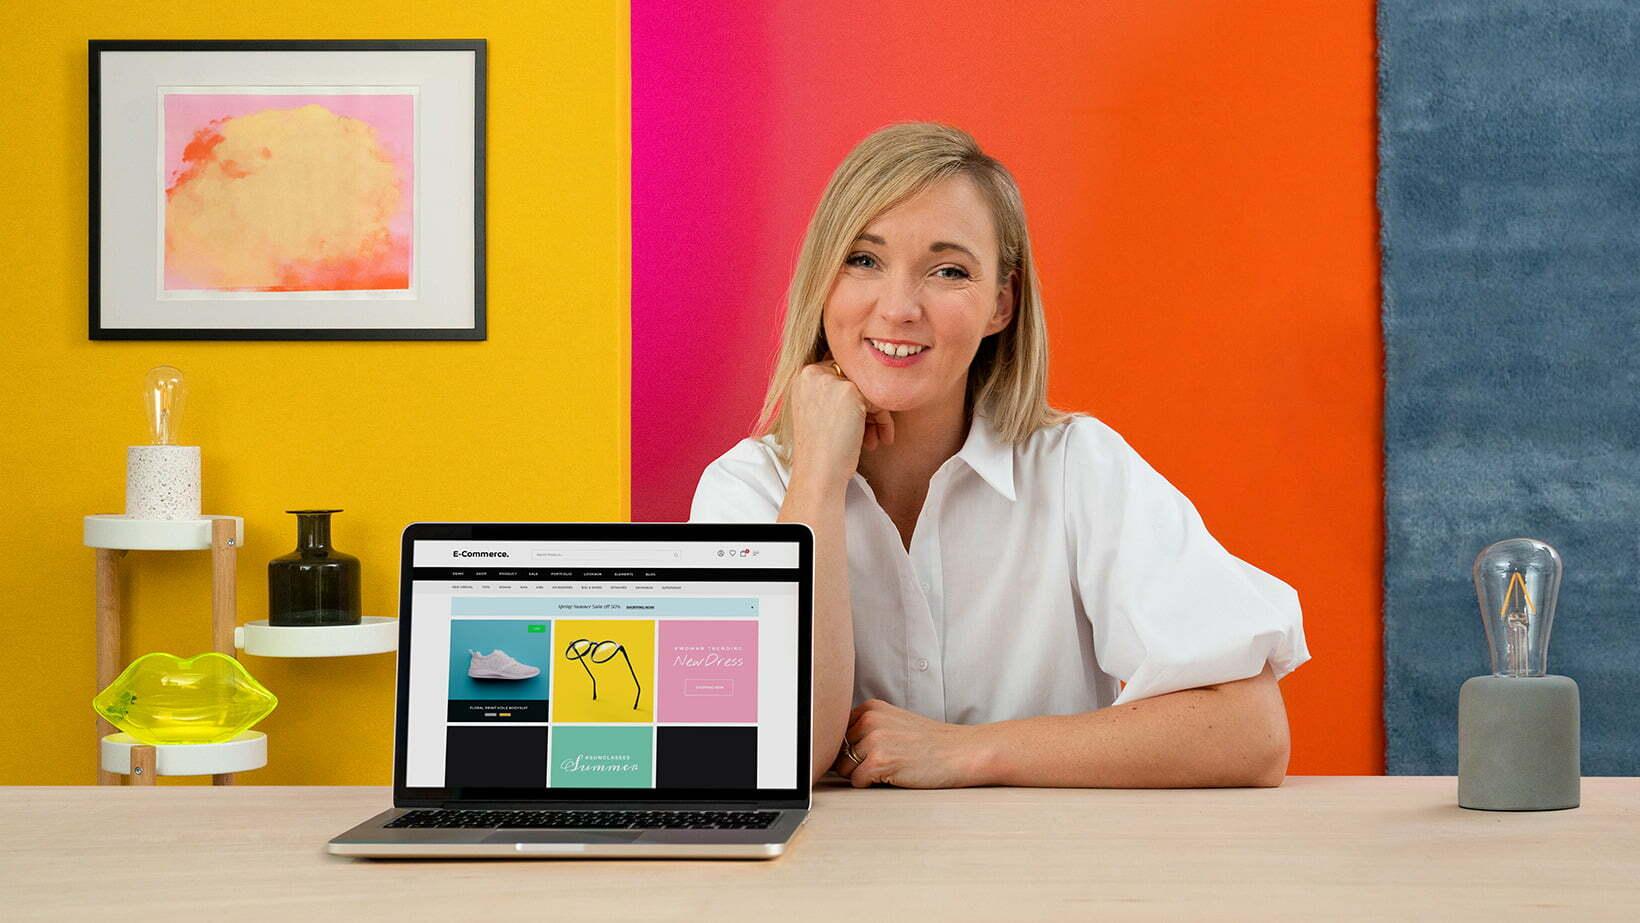 launching an online business2